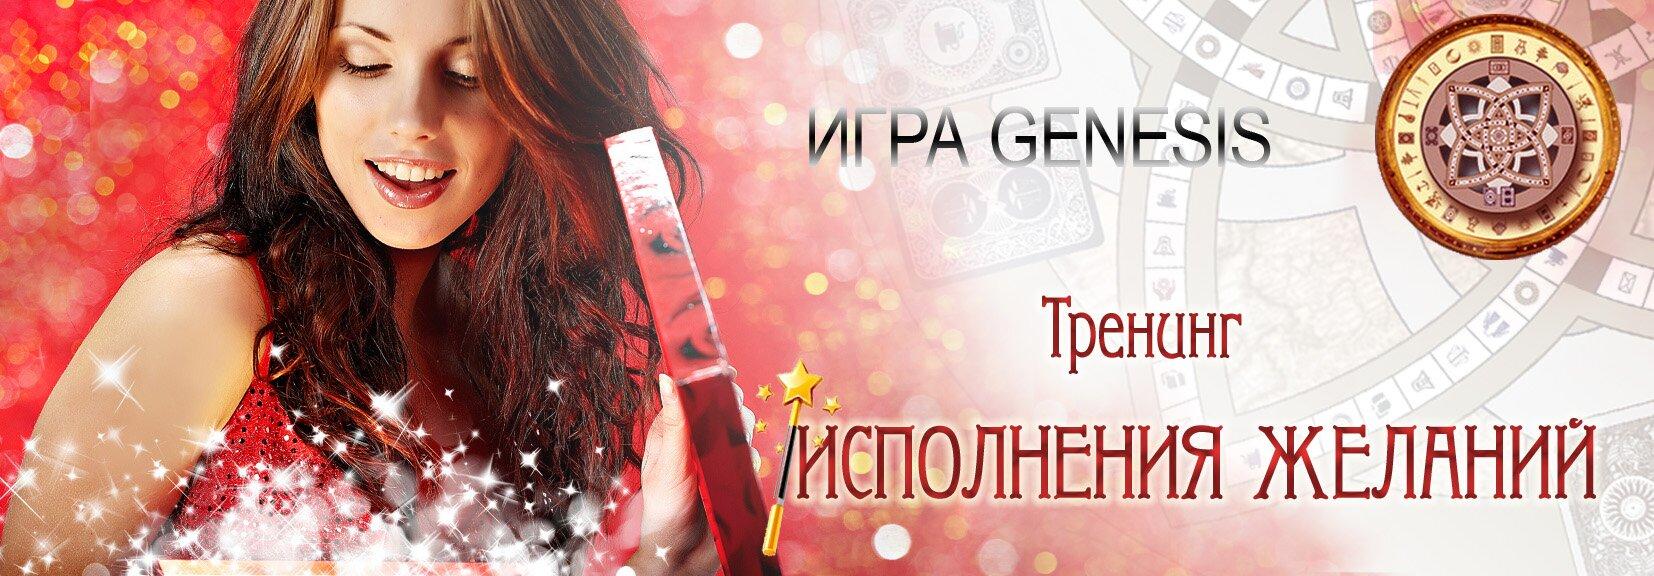 Genesis_Elena shinkova